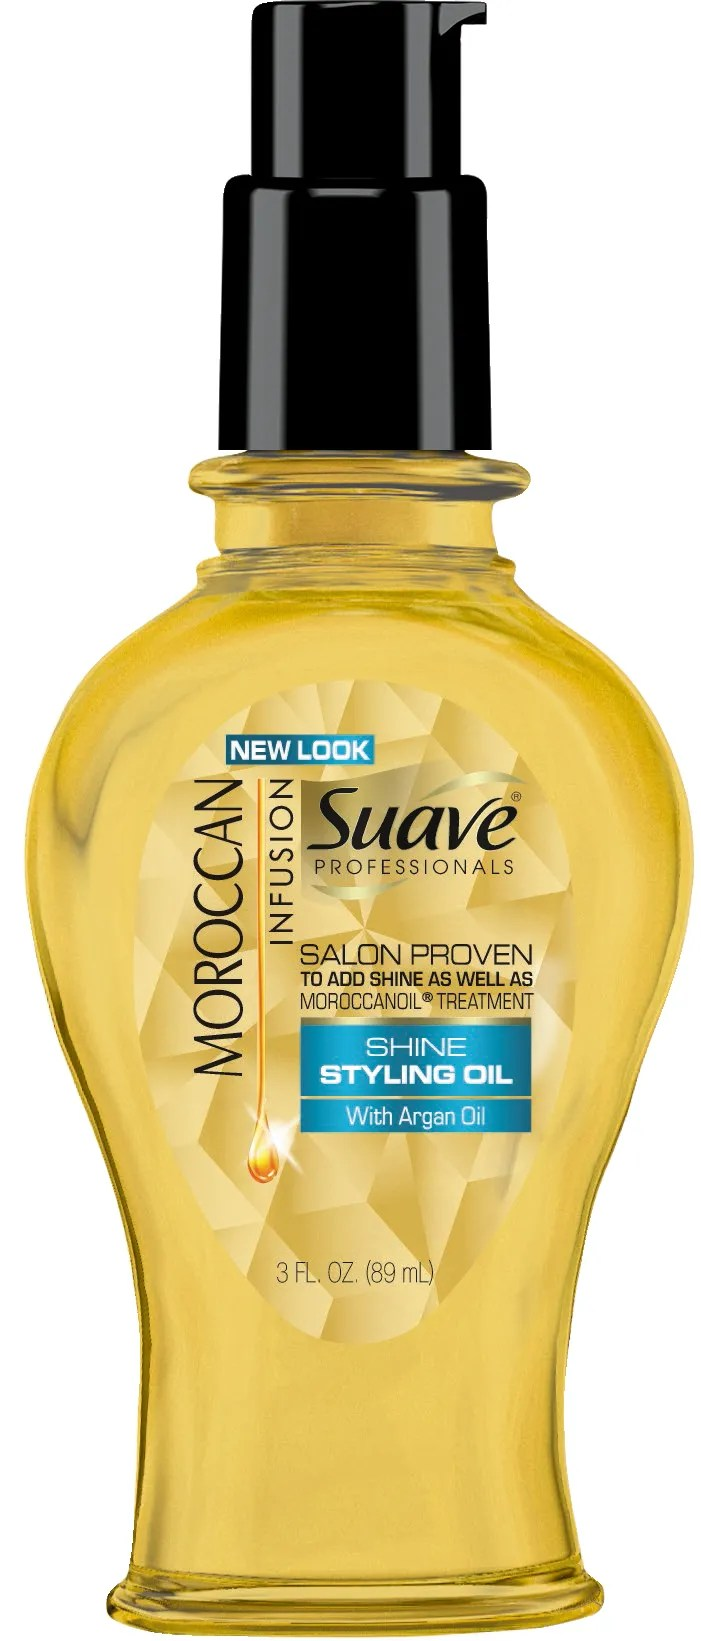 Suave Professionals Dry Shampoo Hair